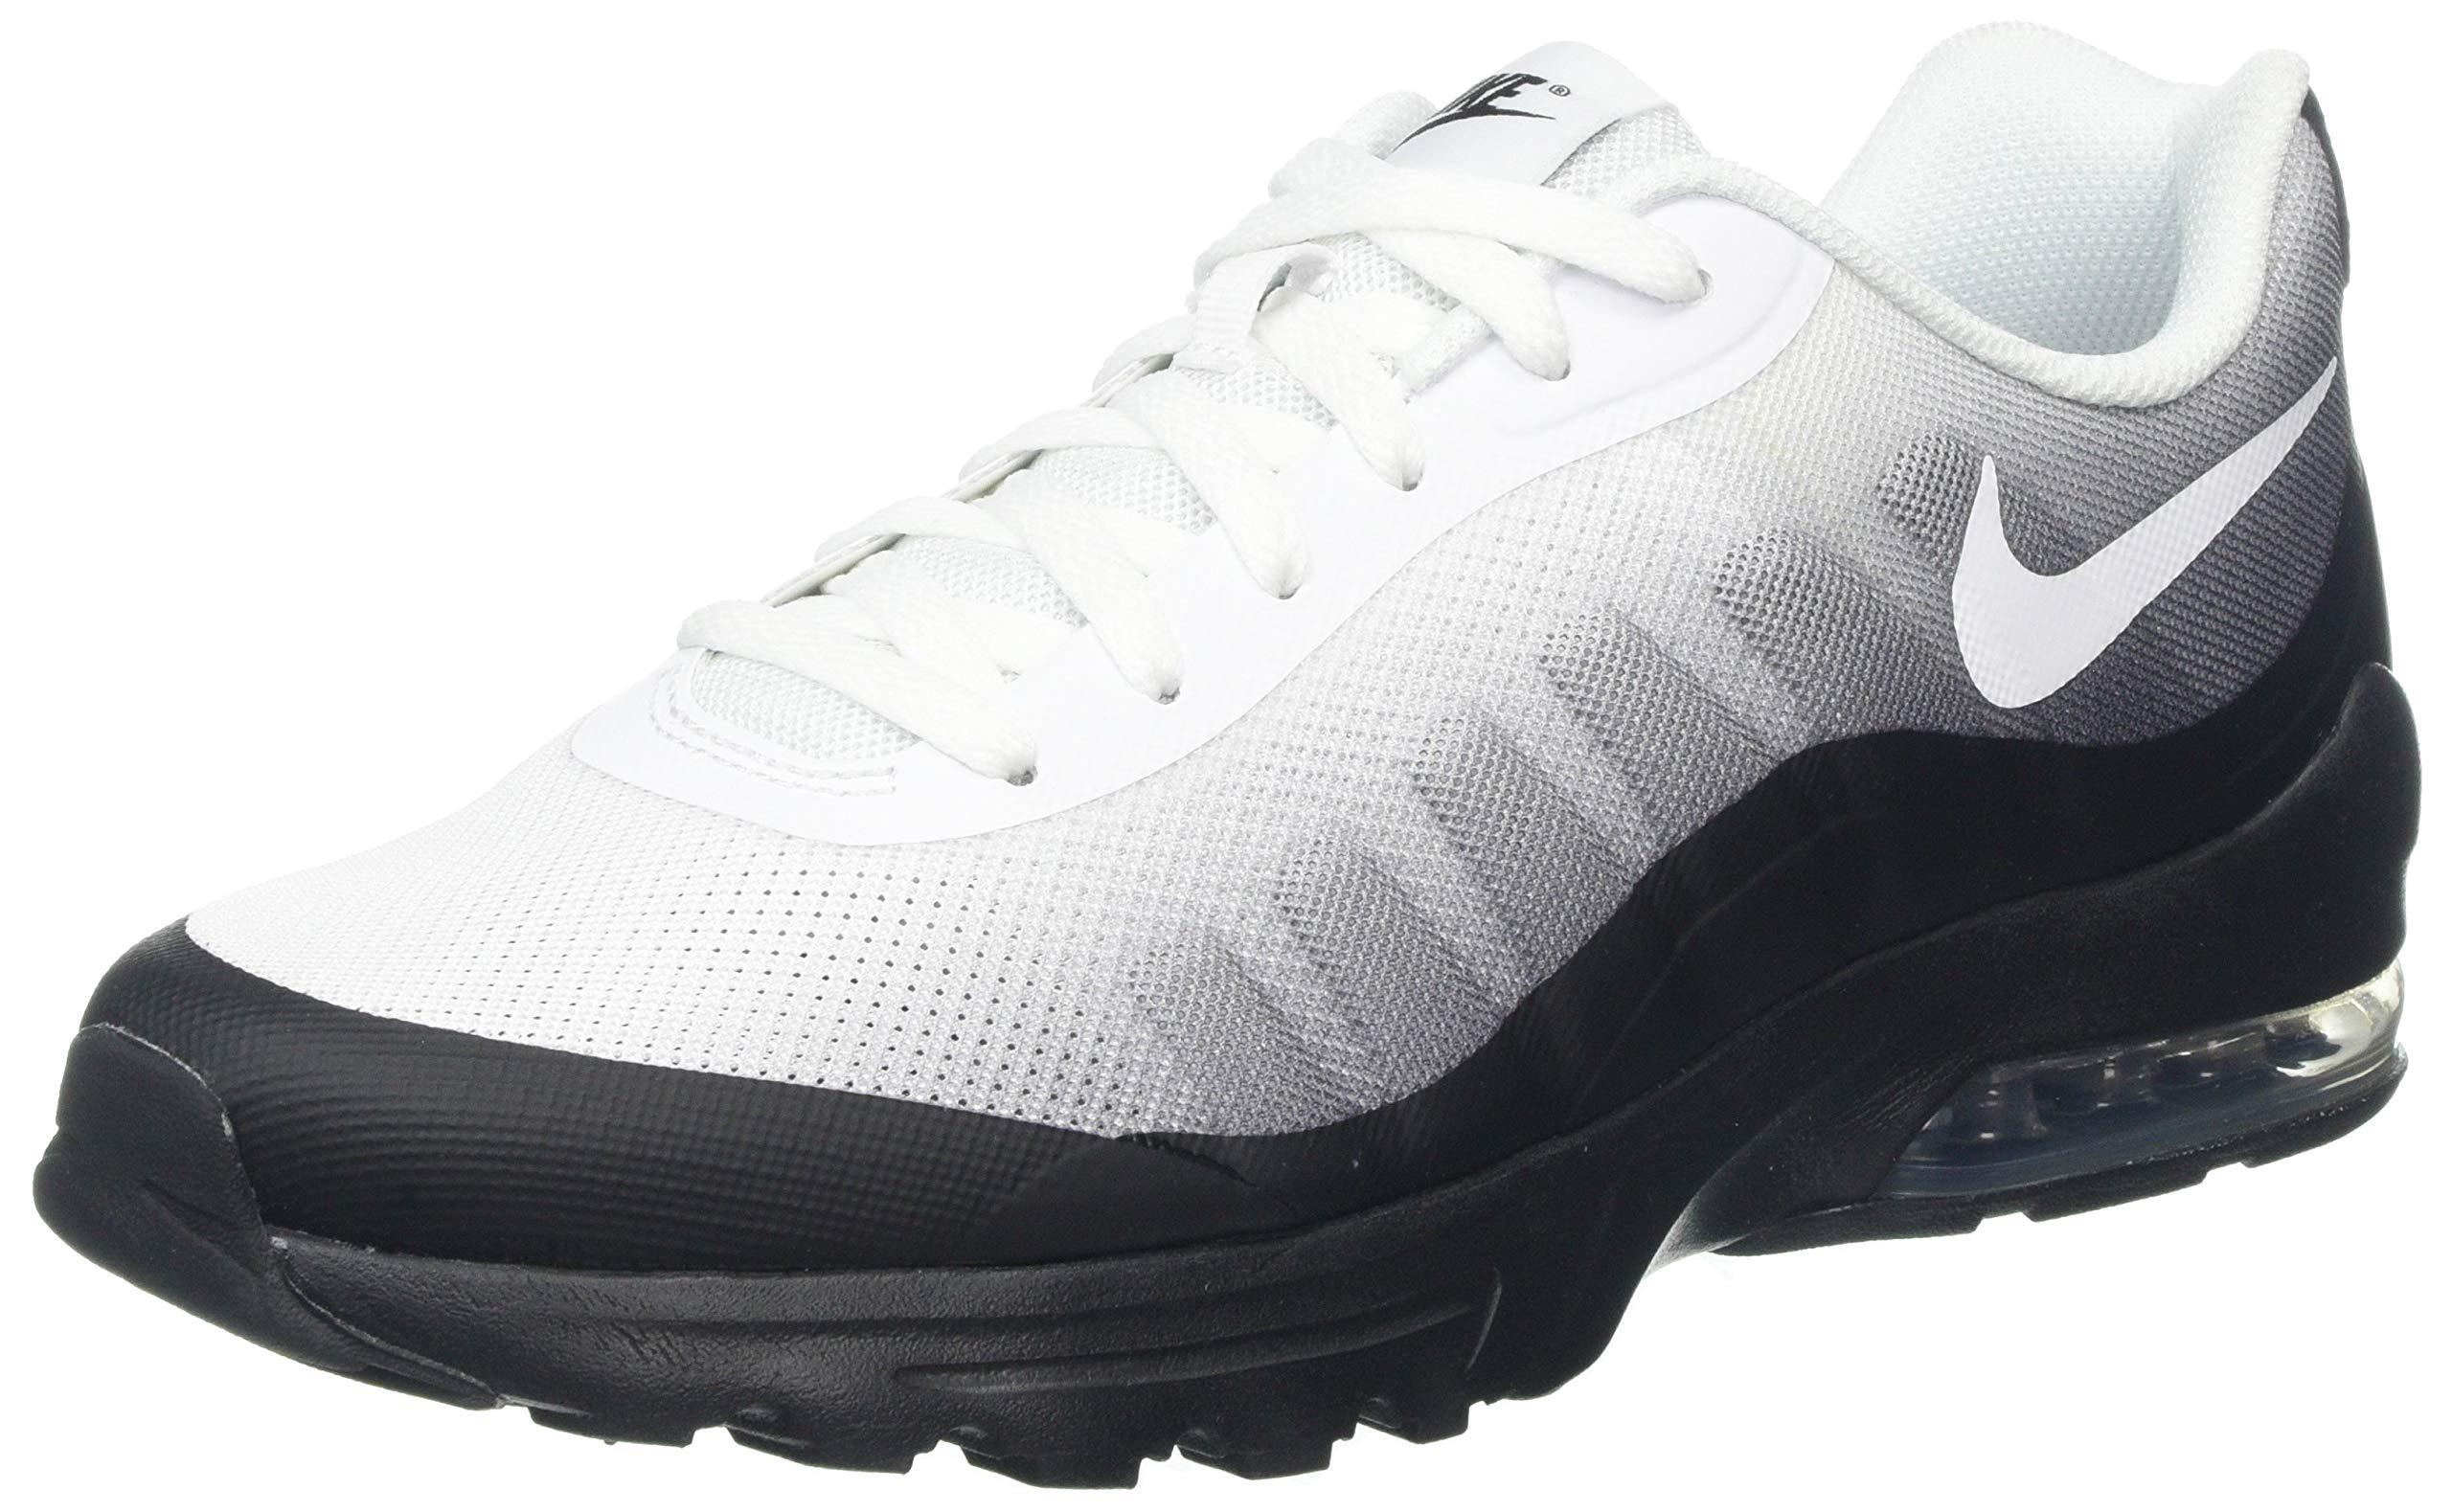 Galleon NIKE Men's Air Max Invigor Print Running Shoes